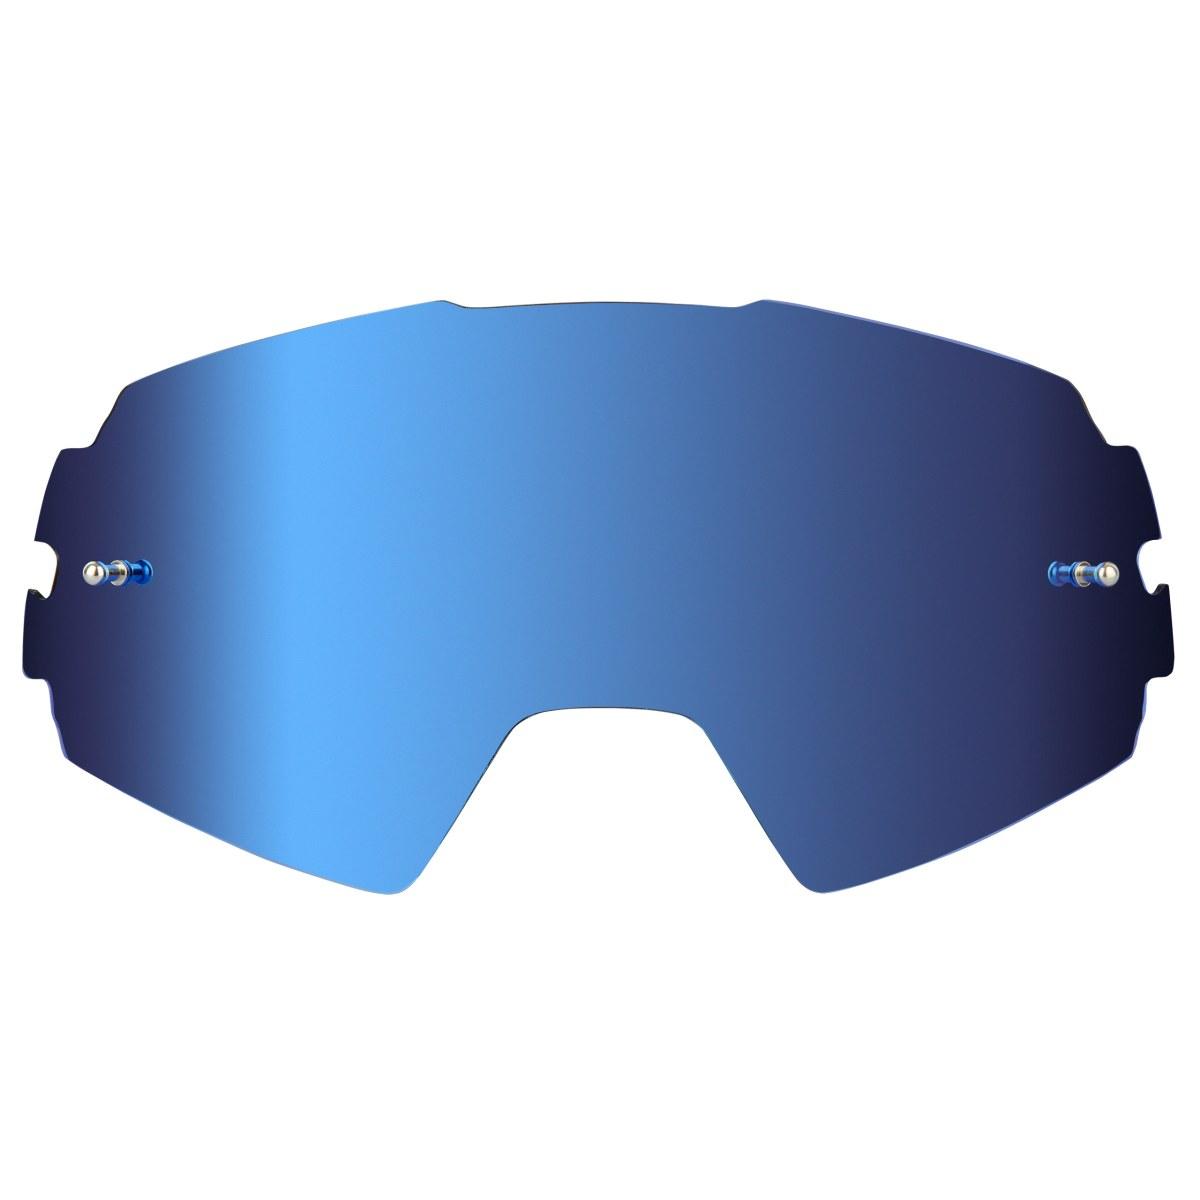 MX_Squad_Space_Blue_Lens_DELAYON_Eyewear